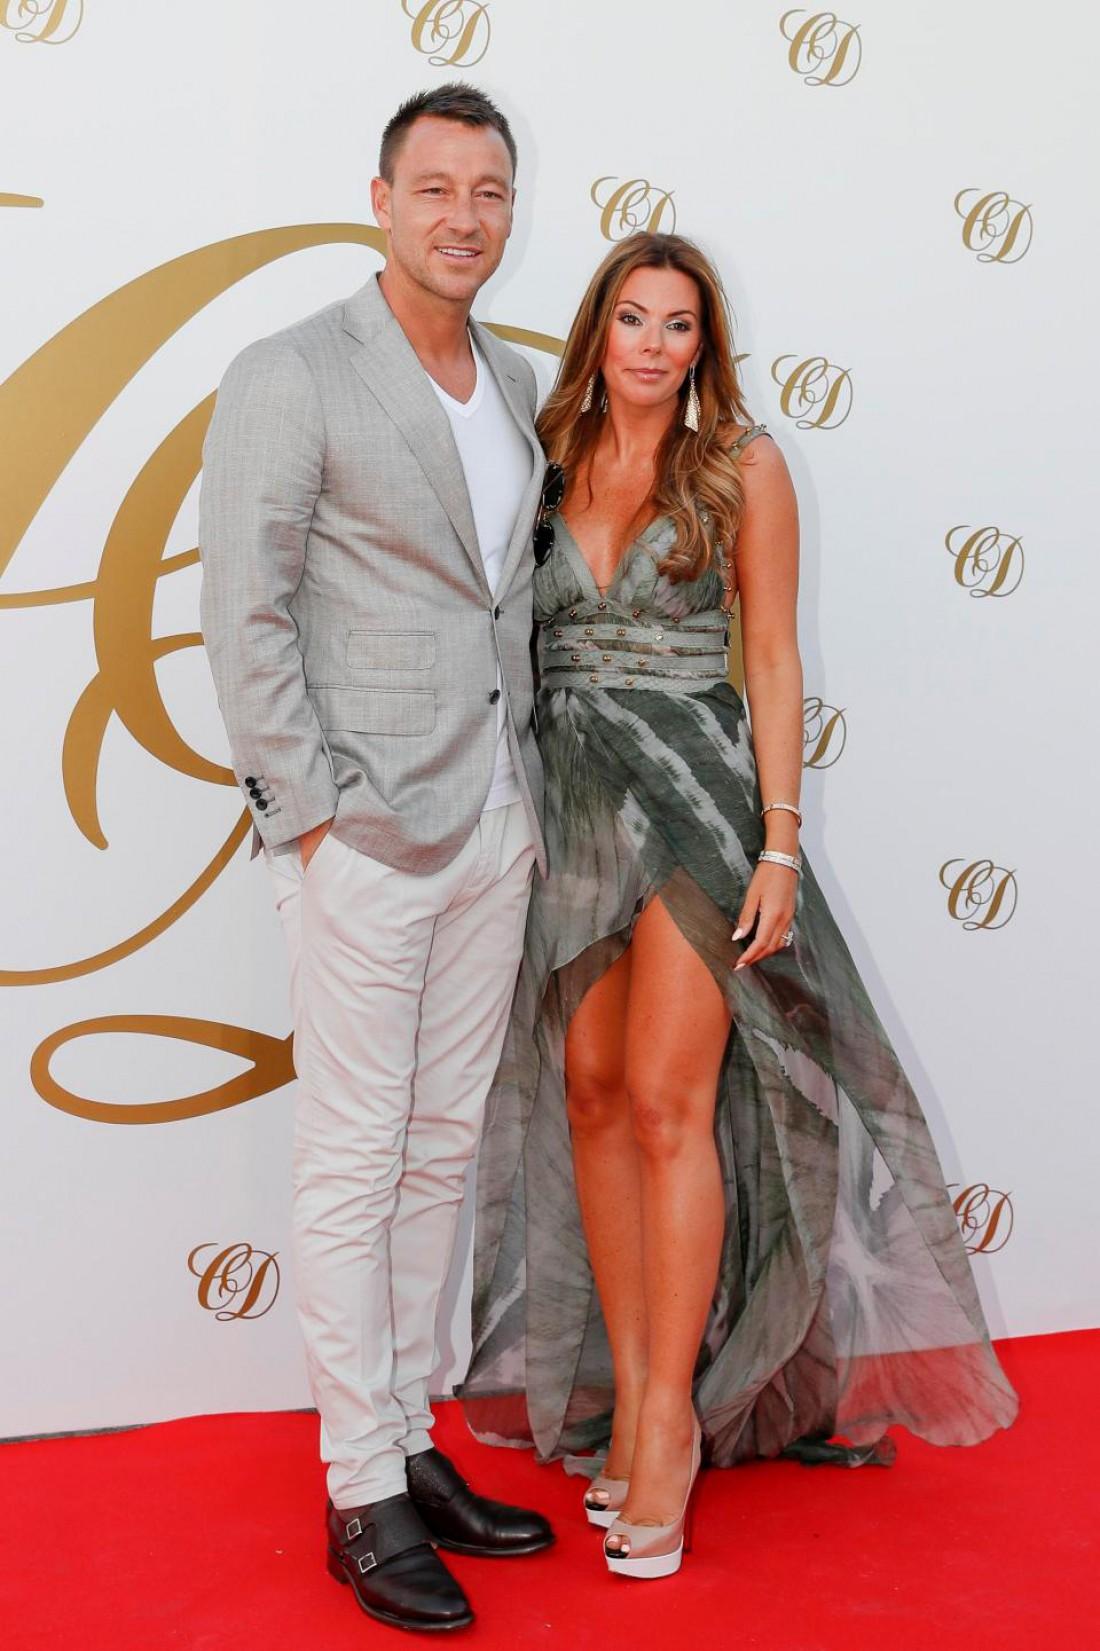 Легенда Челси Джон Терри с супругой Софи